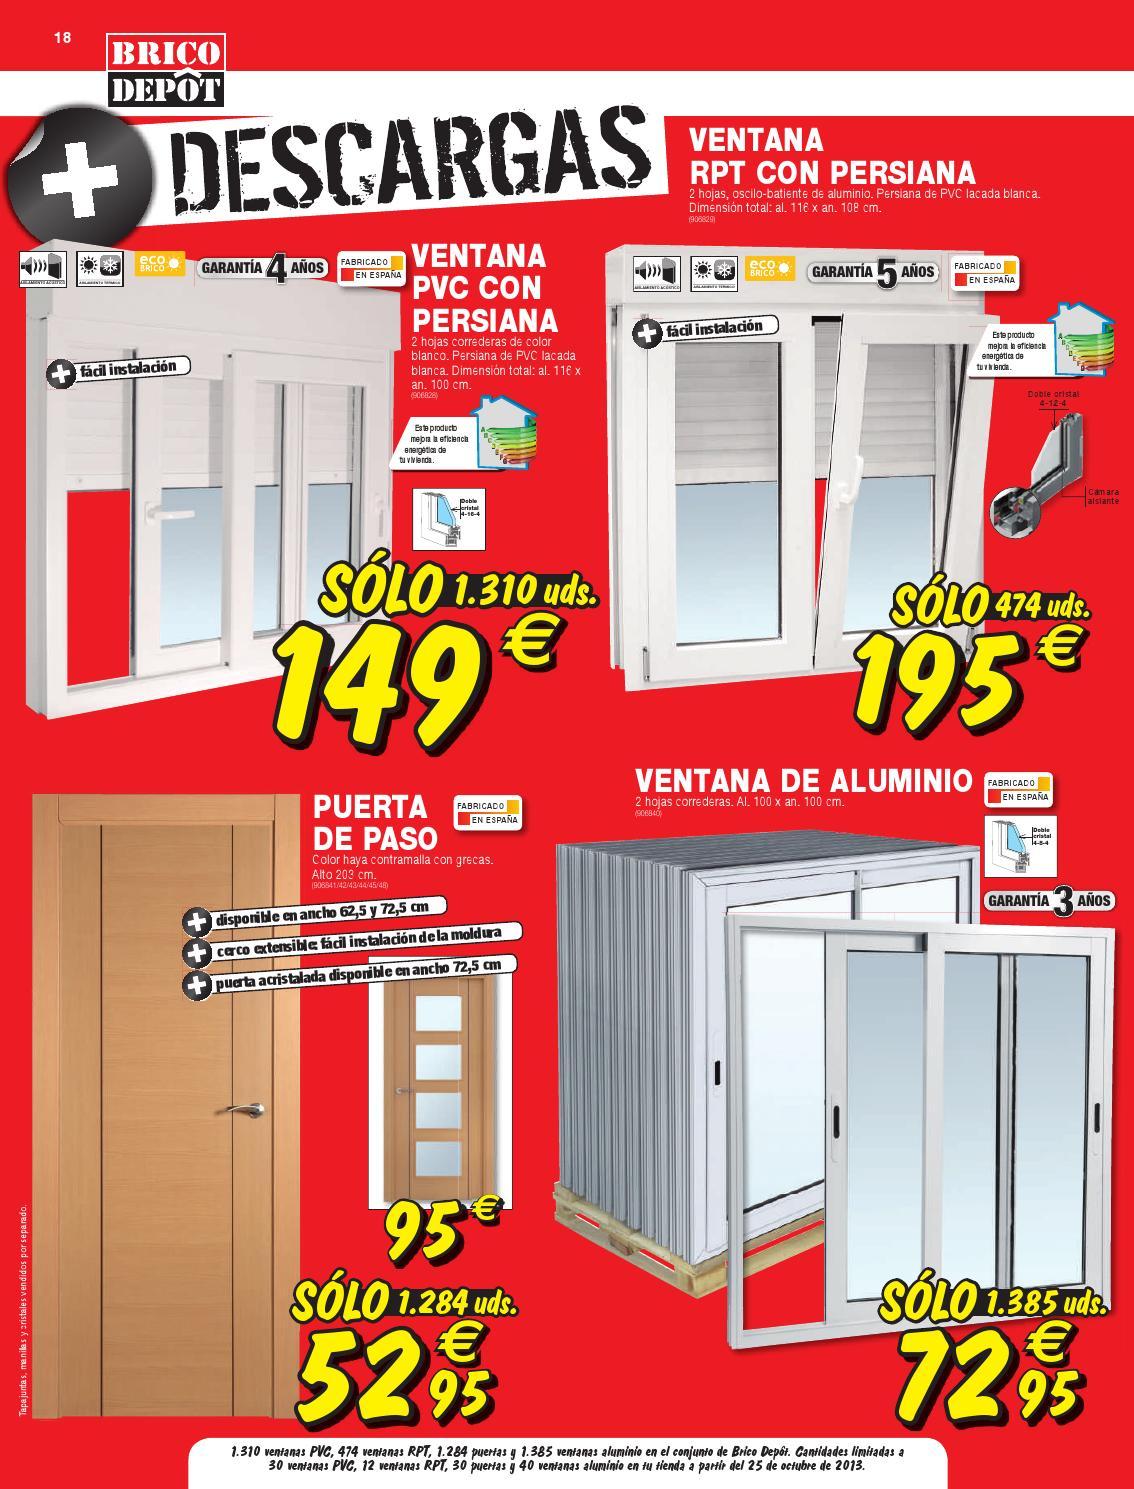 Brico depot puertas plegables simple affordable casetas for Casetas de madera baratas para jardin brico depot